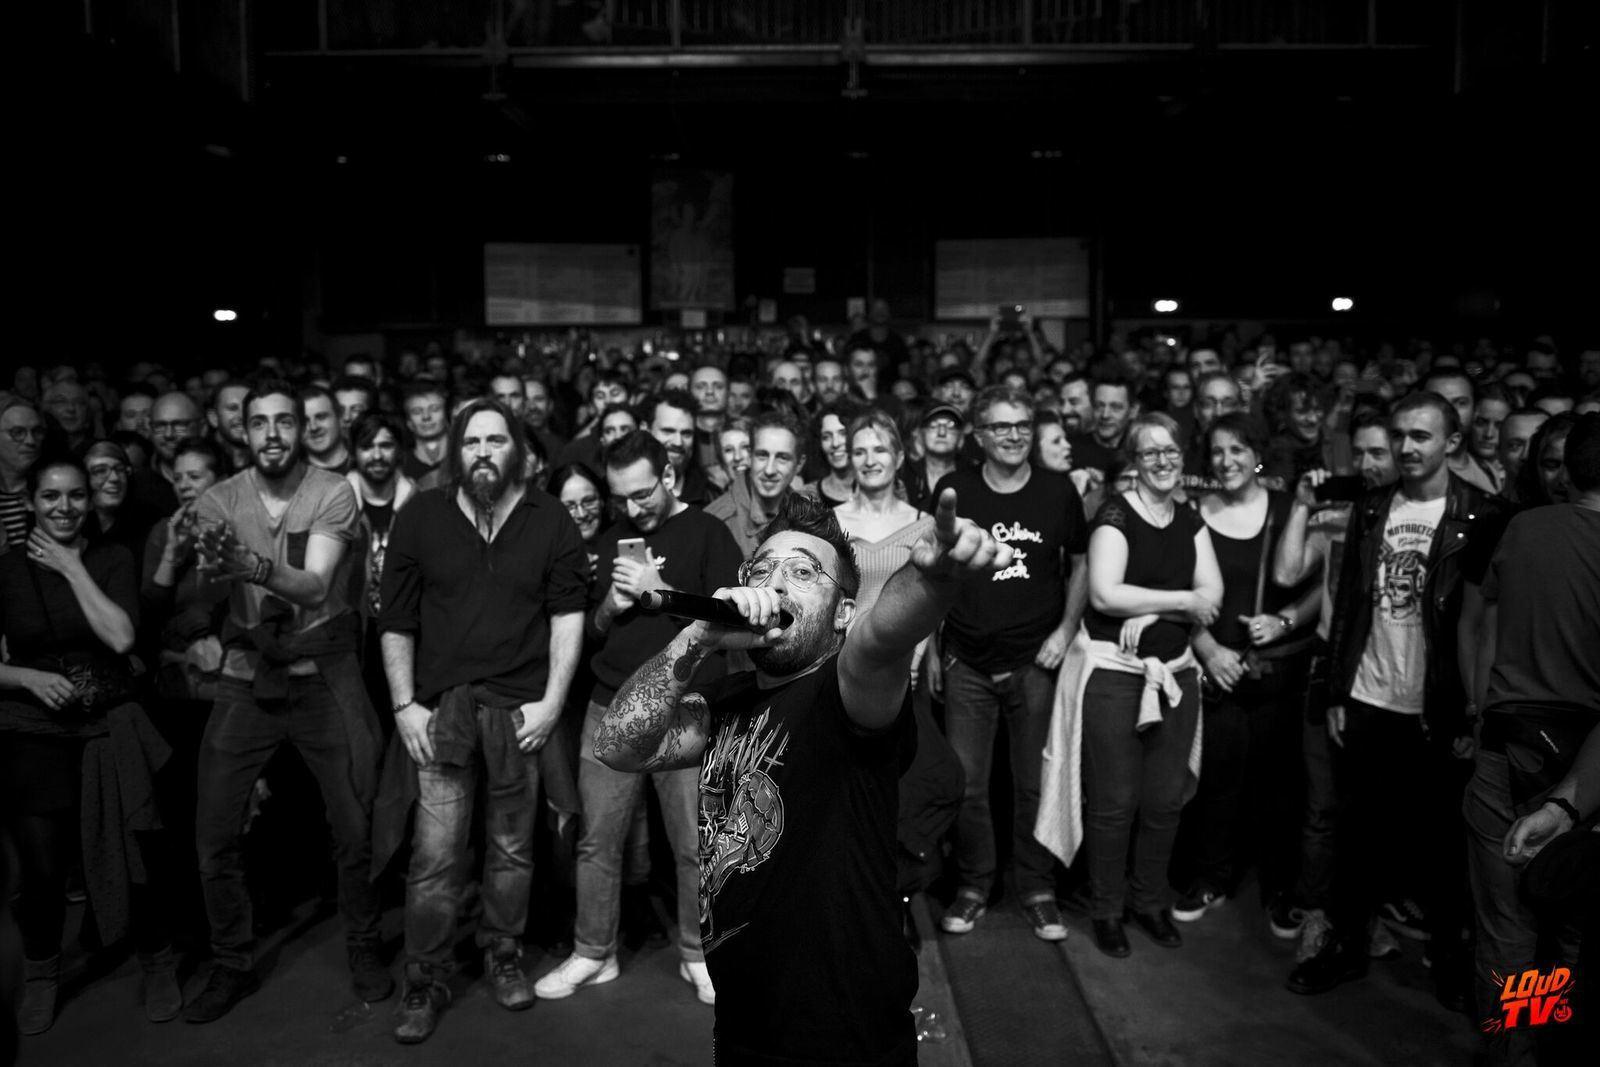 Live report MOAAN EXIS / TAMBOURS DU BRONX / SIDILARSEN - Toulouse le 30 Nov 2019